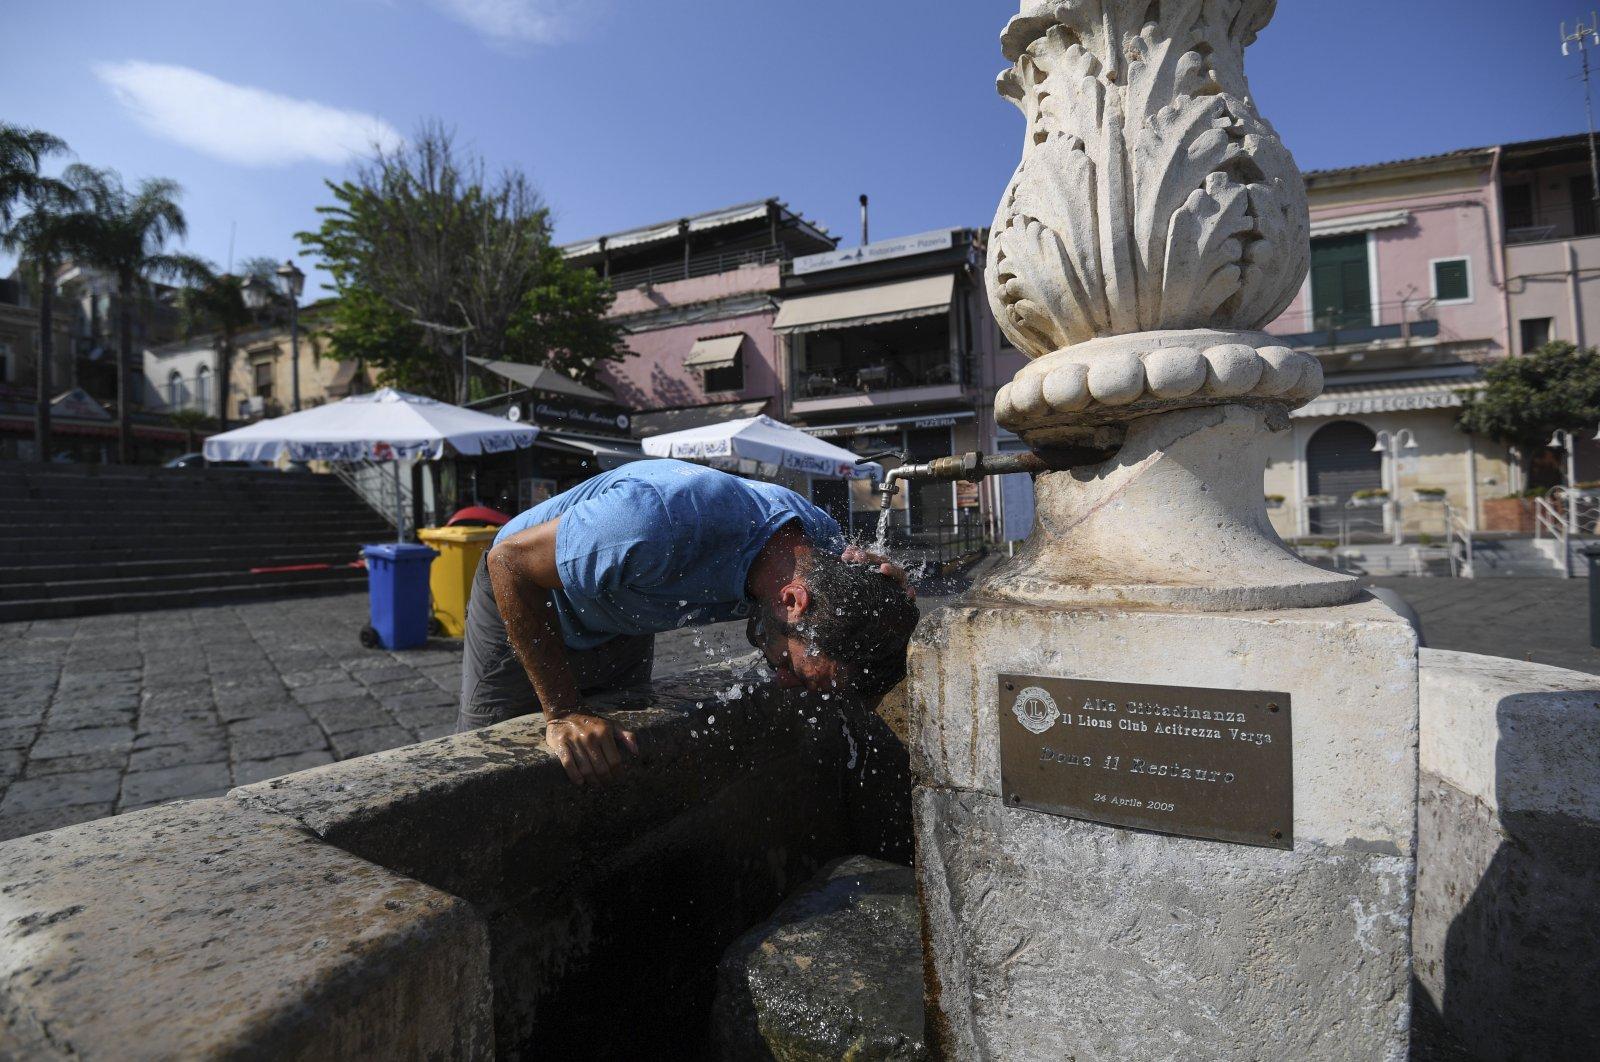 A man refreshes himself at a fountain in Aci Trezza, near Catania, Sicily, Italy, Aug. 13, 2021. (AP Photo)